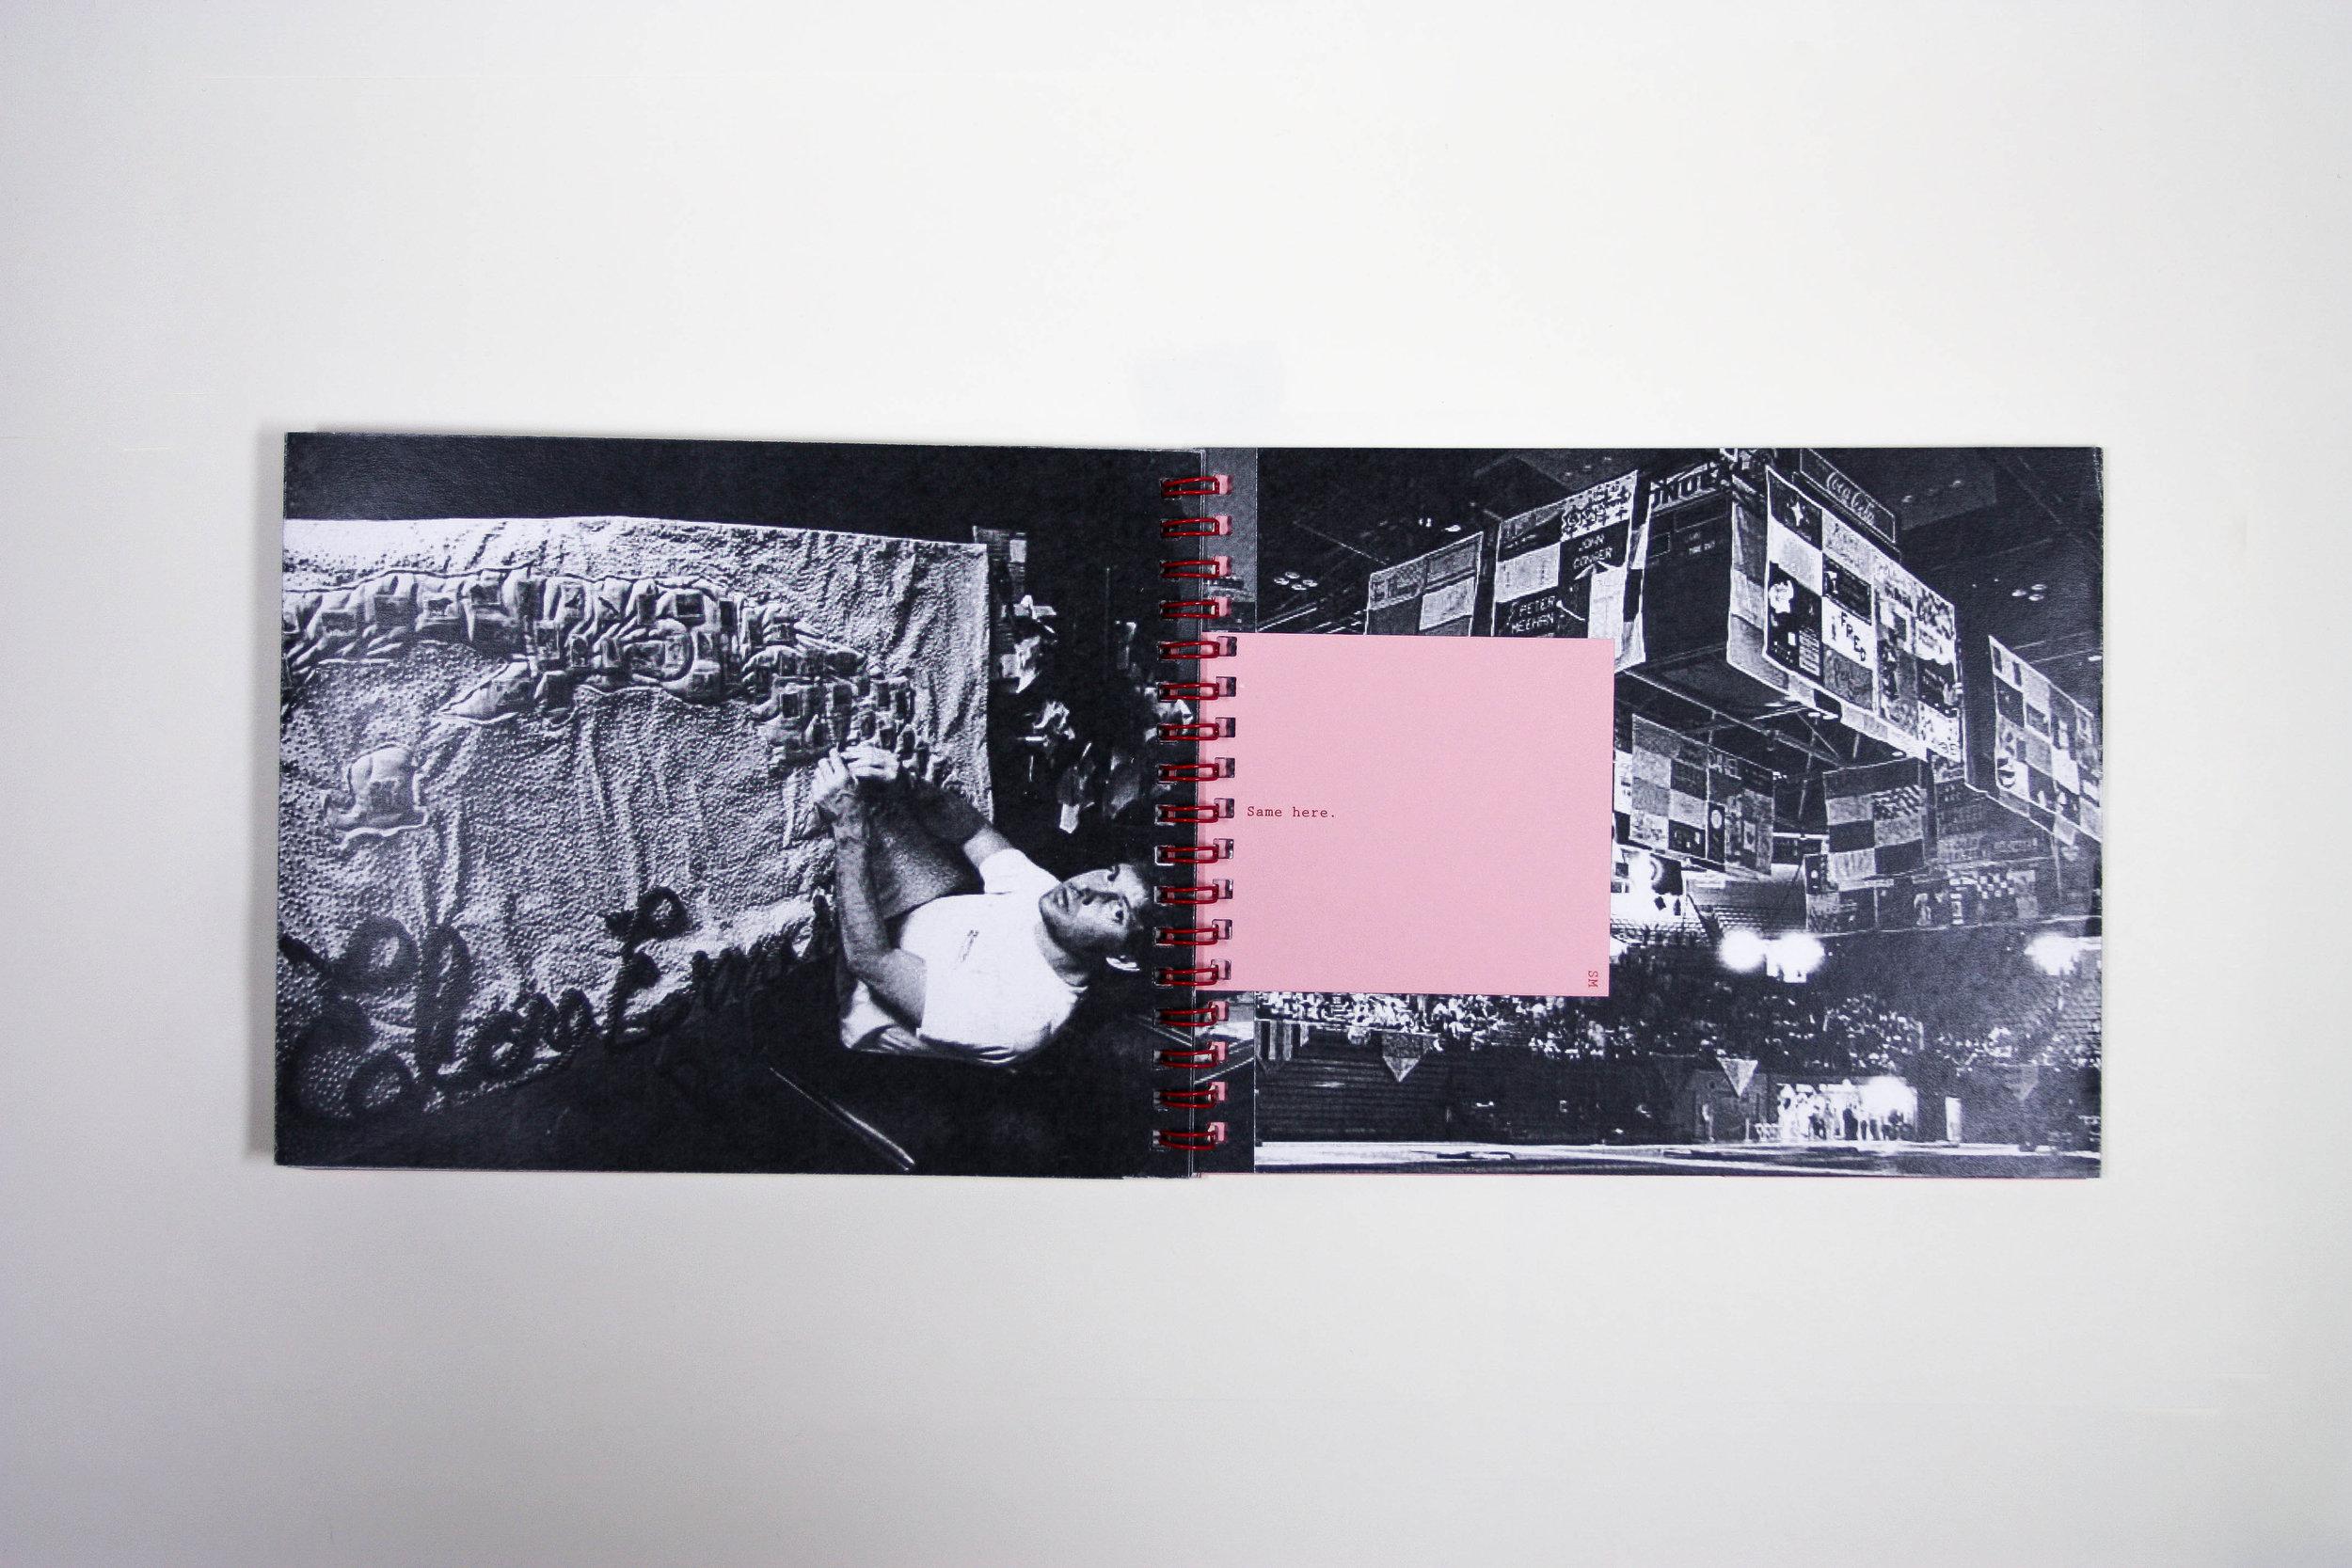 estory-bookimages-22.jpg